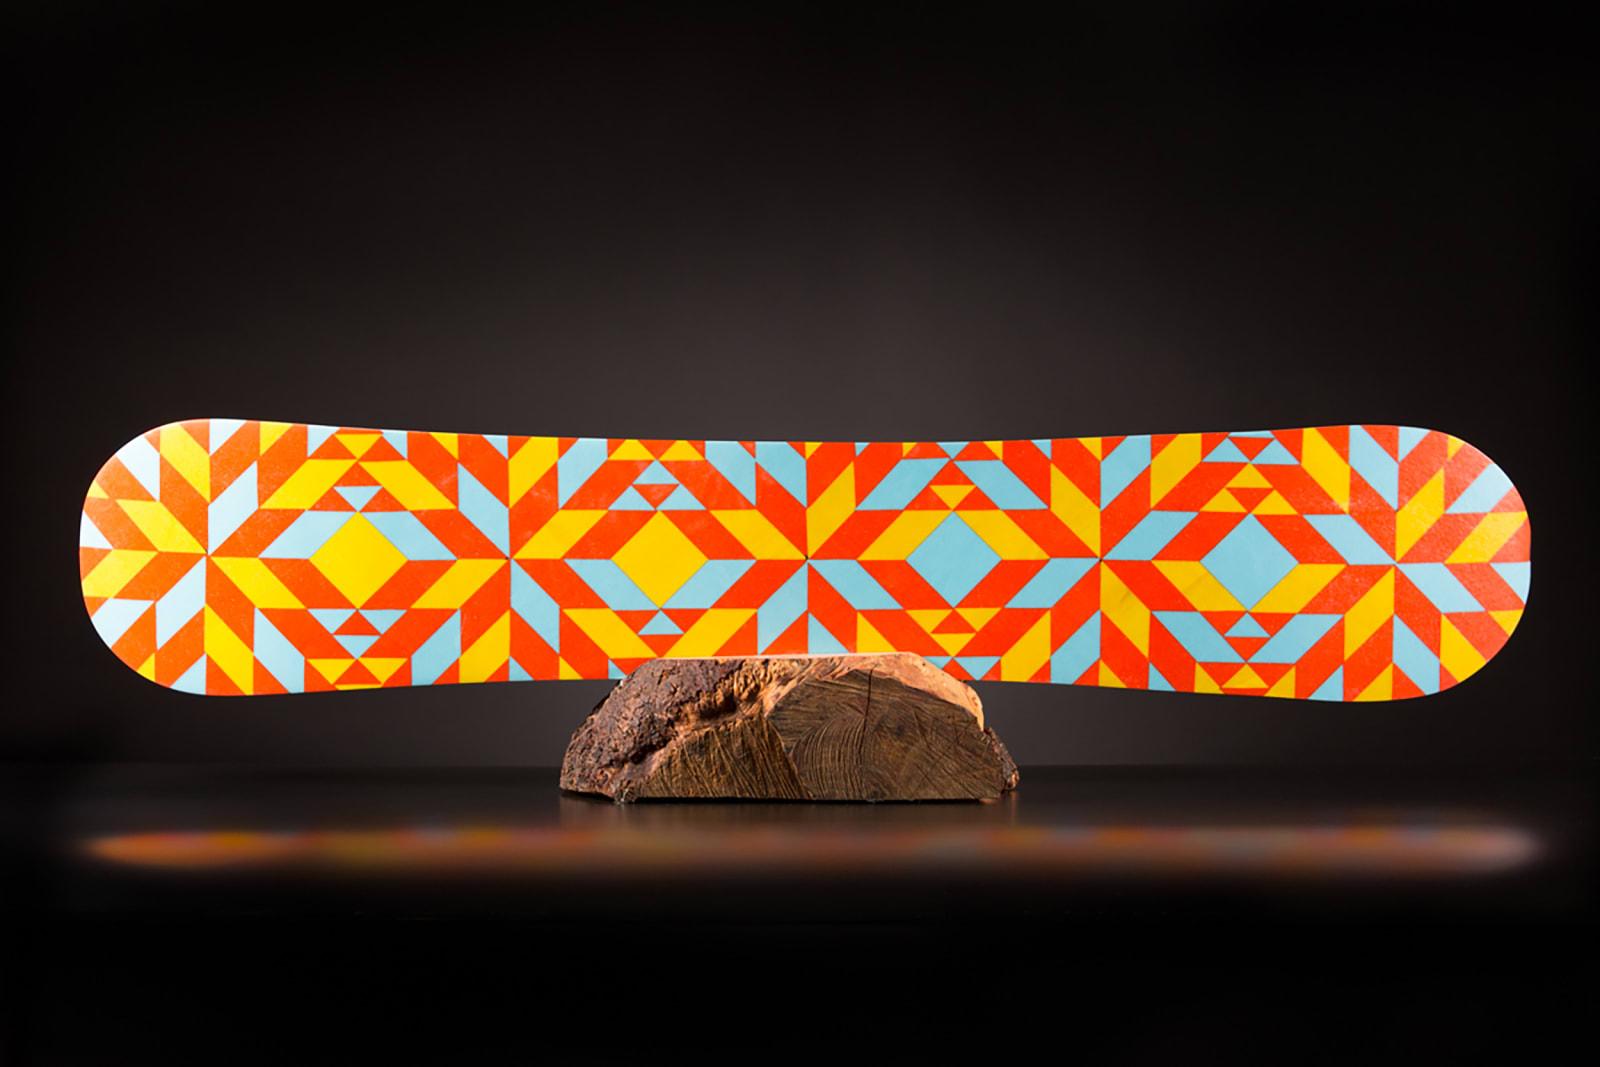 Brennan Kasperzak, Multi Color Range and Quilt, 2017